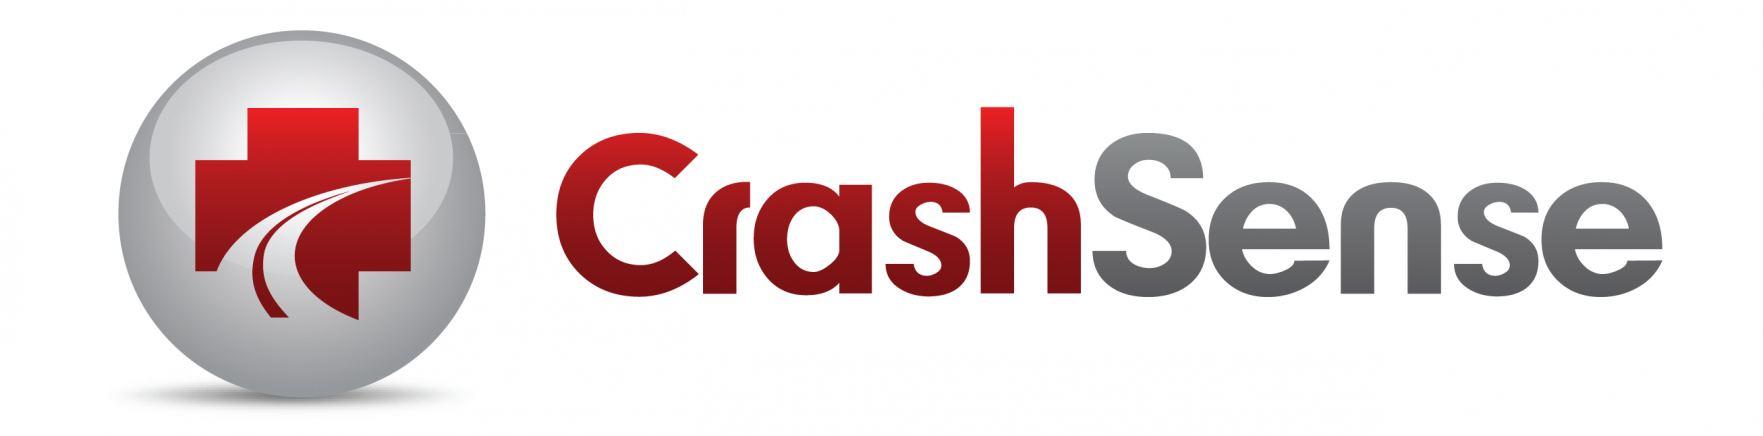 CrashSense Logo